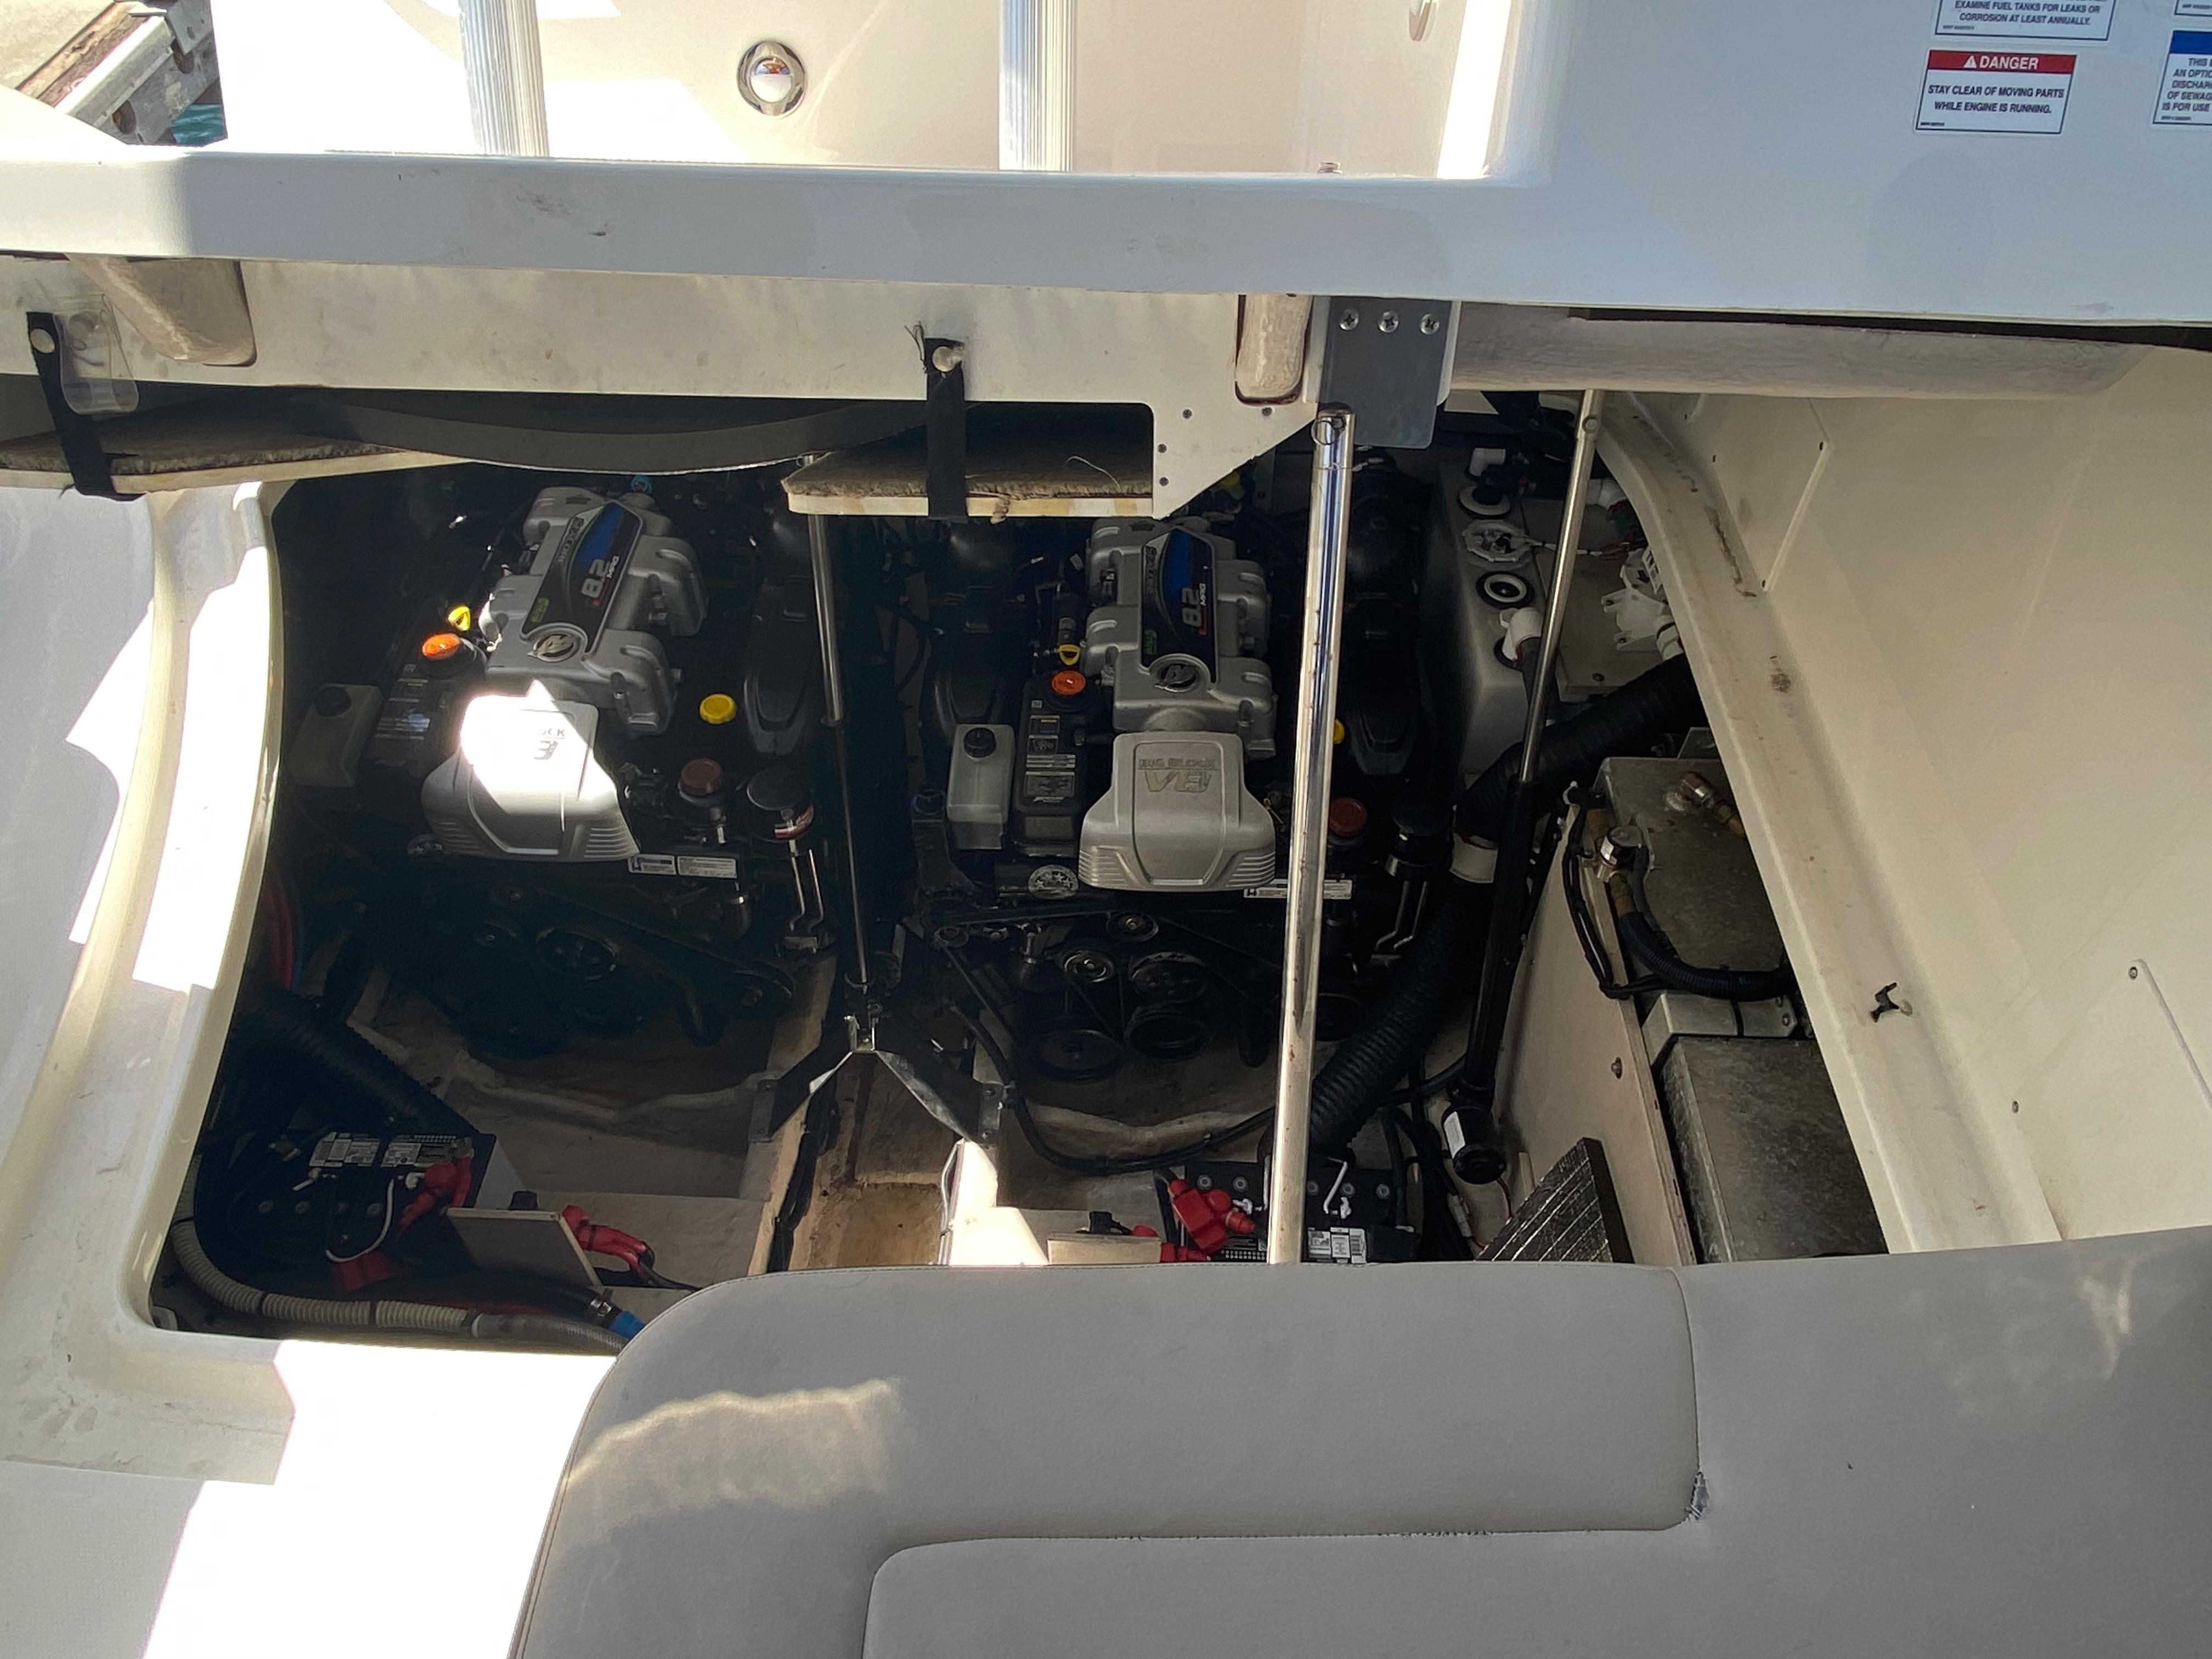 2015 Sea Ray 350 Sundancer #TB8539MC inventory image at Sun Country Coastal in Dana Point